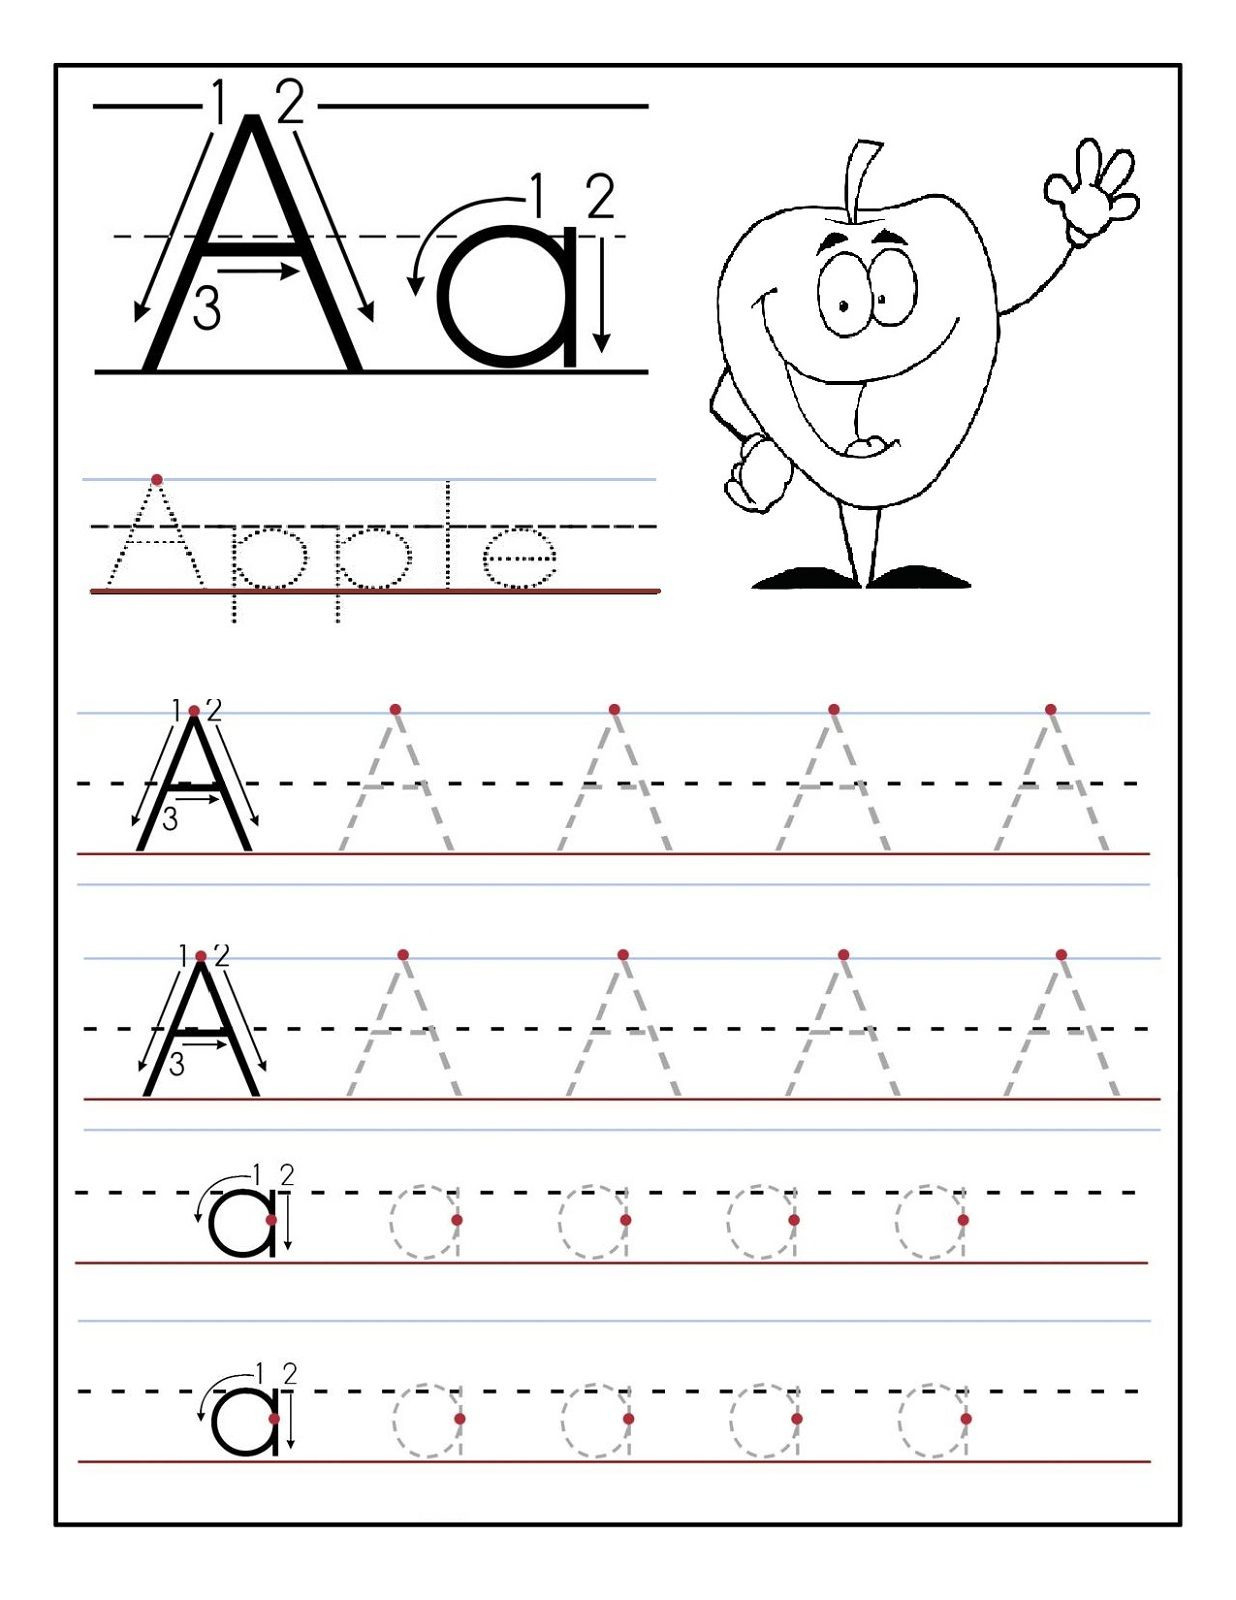 Abc Worksheets For Preschool For Print Math Worksheet For